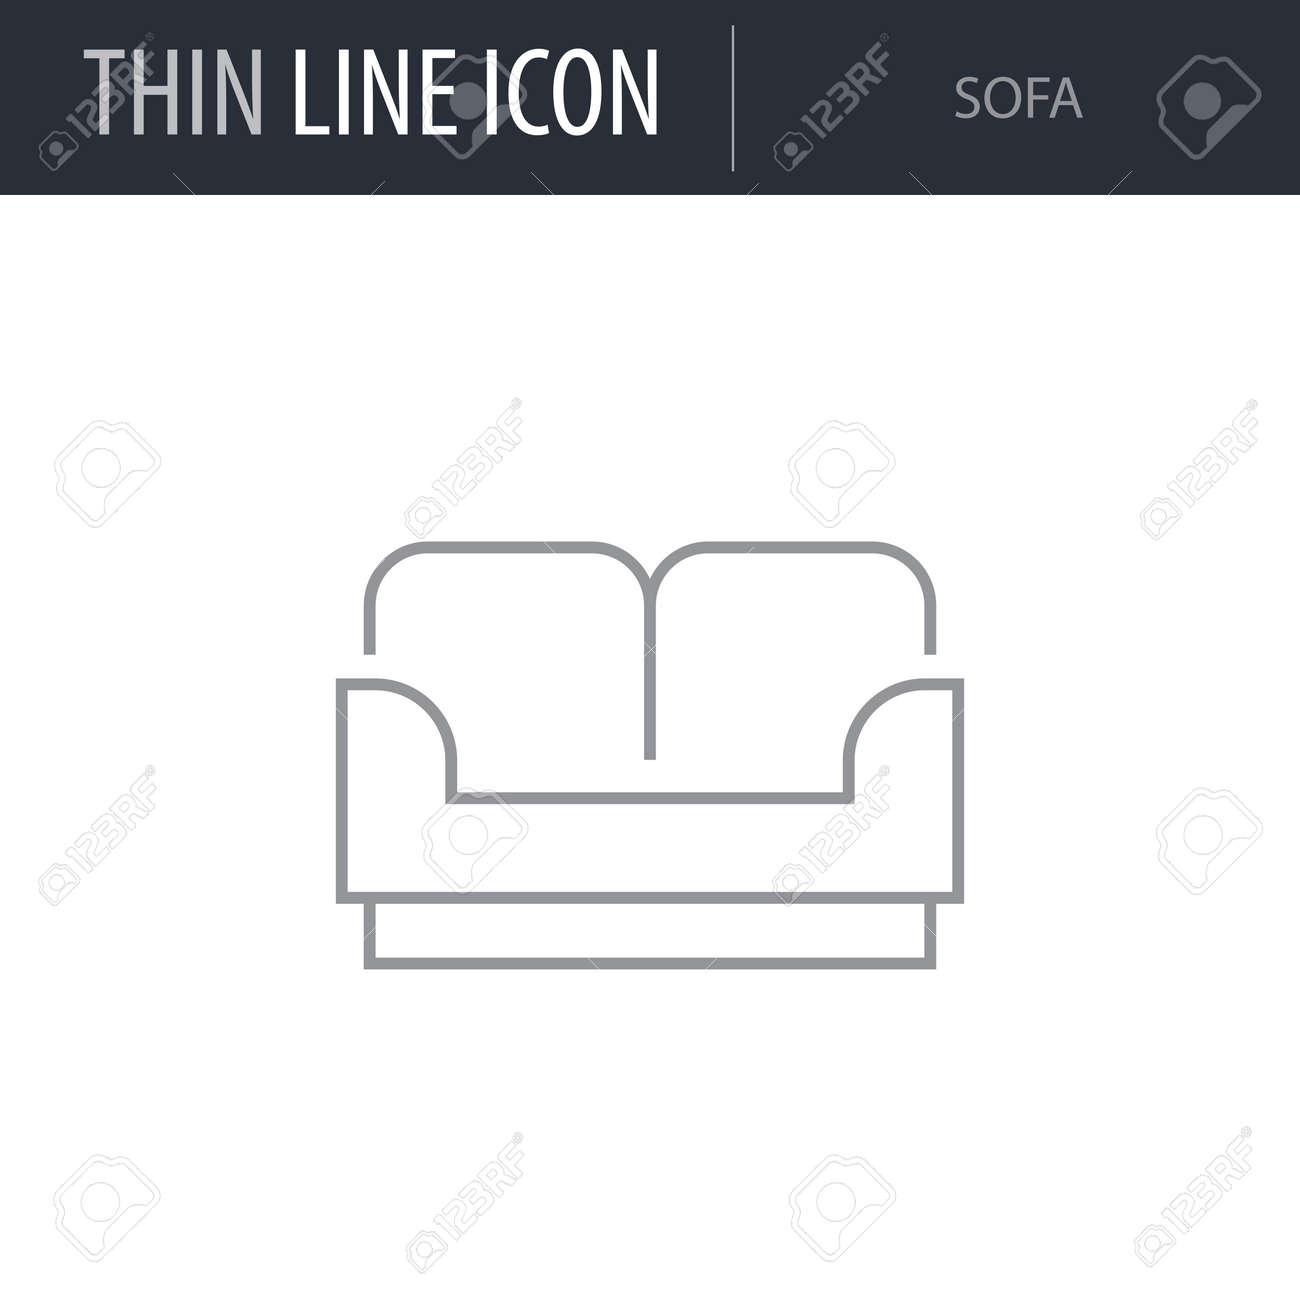 Terrific Symbol Of Sofa Thin Line Icon Of Furniture Stroke Pictogram Cjindustries Chair Design For Home Cjindustriesco